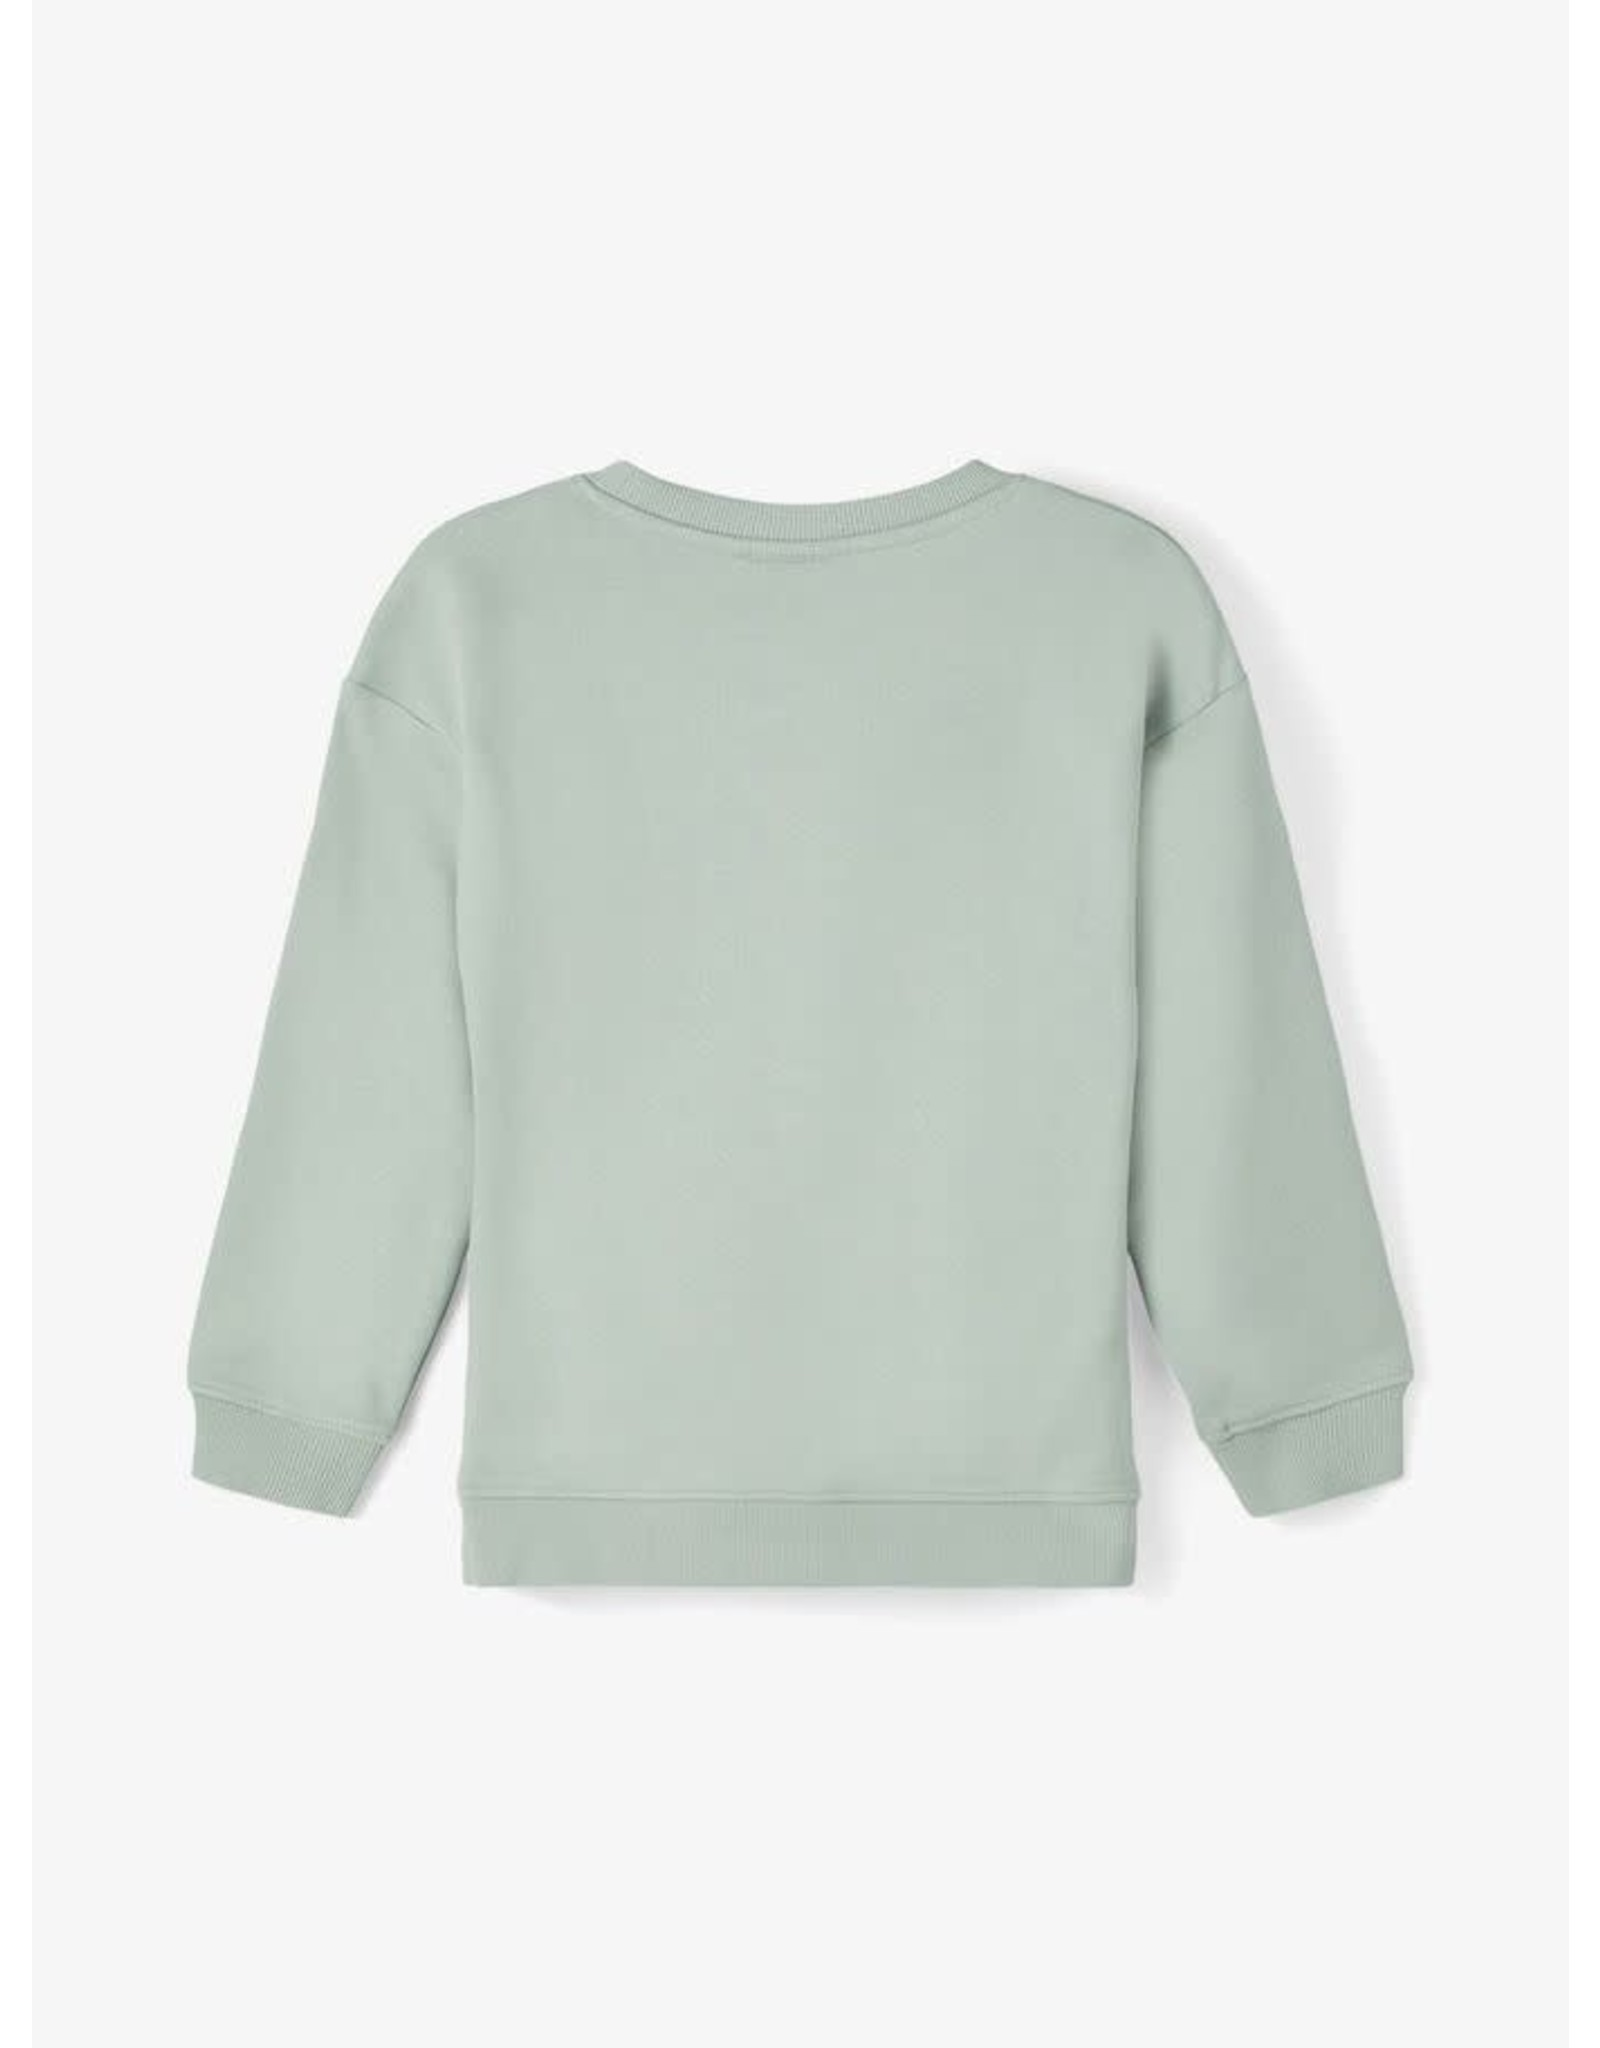 Name It Zacht groene katoenen sweatstof trui